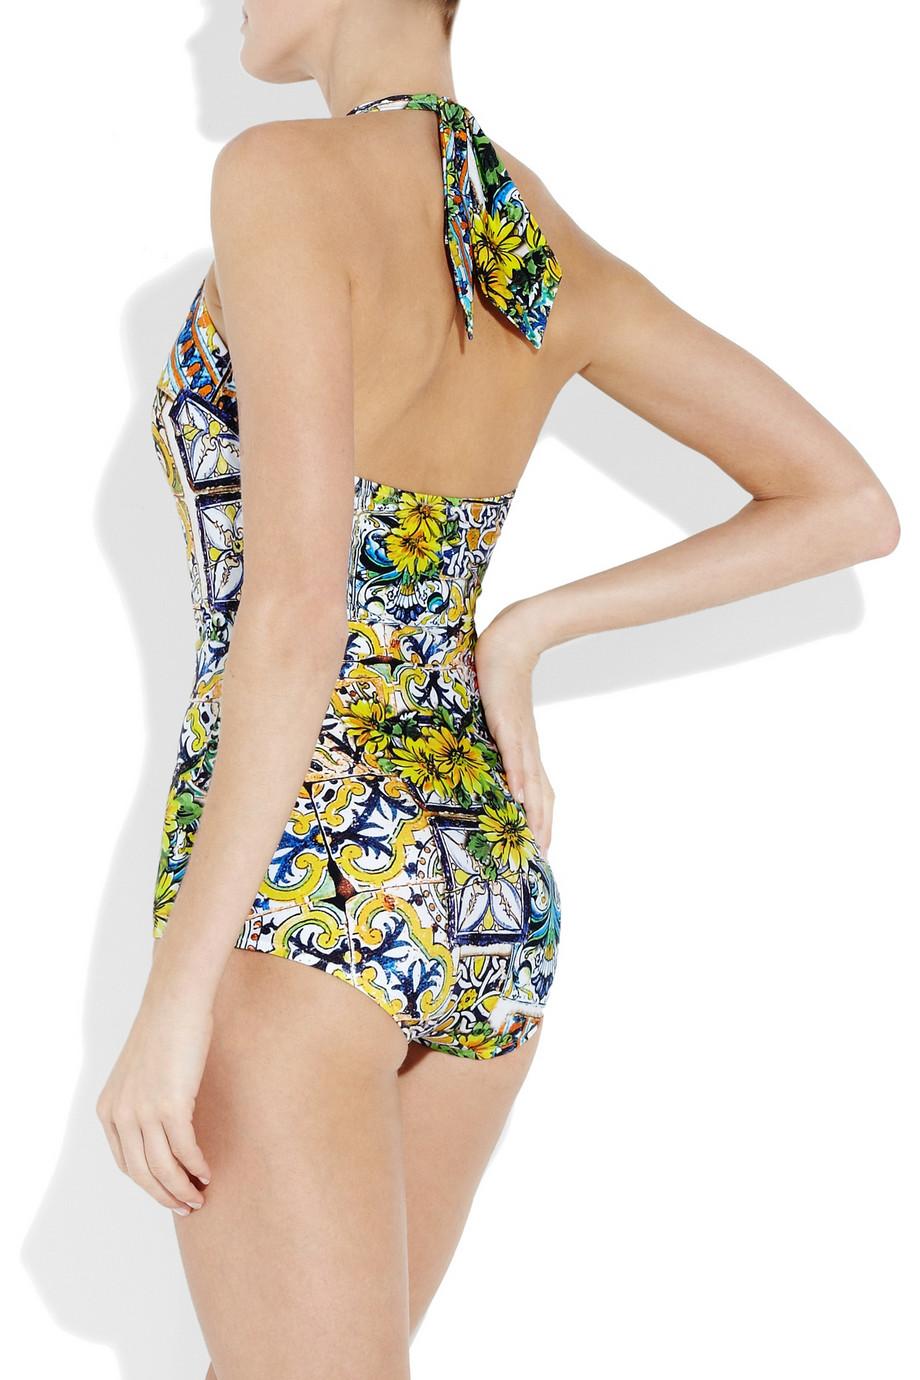 Dolce & gabbana Printed Halterneck Swimsuit in Yellow